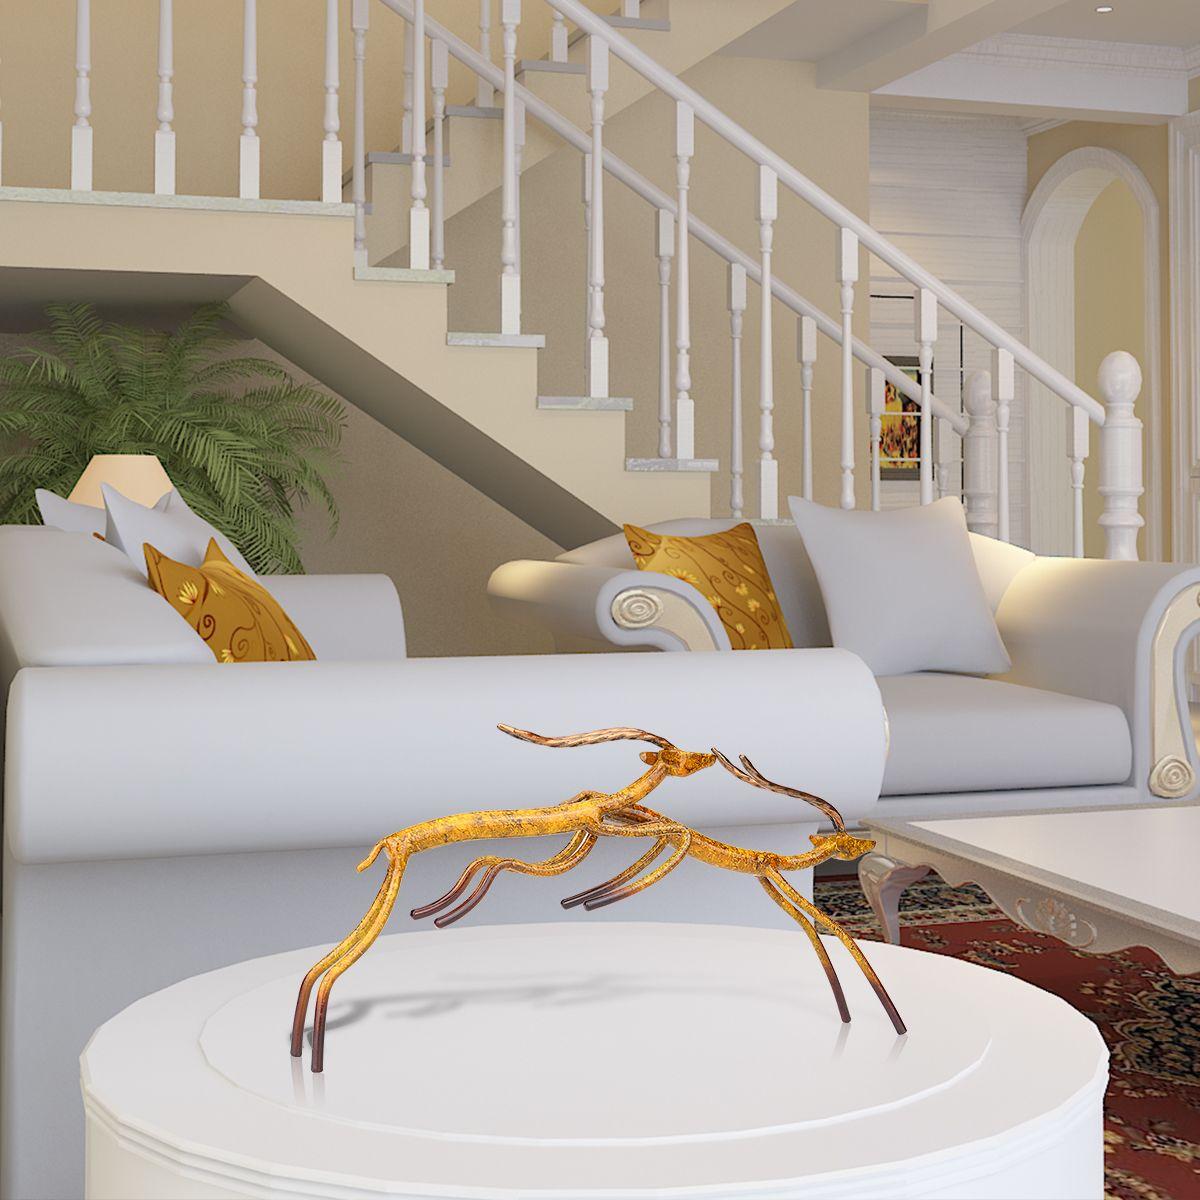 Decoracion hogar barato fabulous ideas de decoracin - Decoracion de hogar barata ...